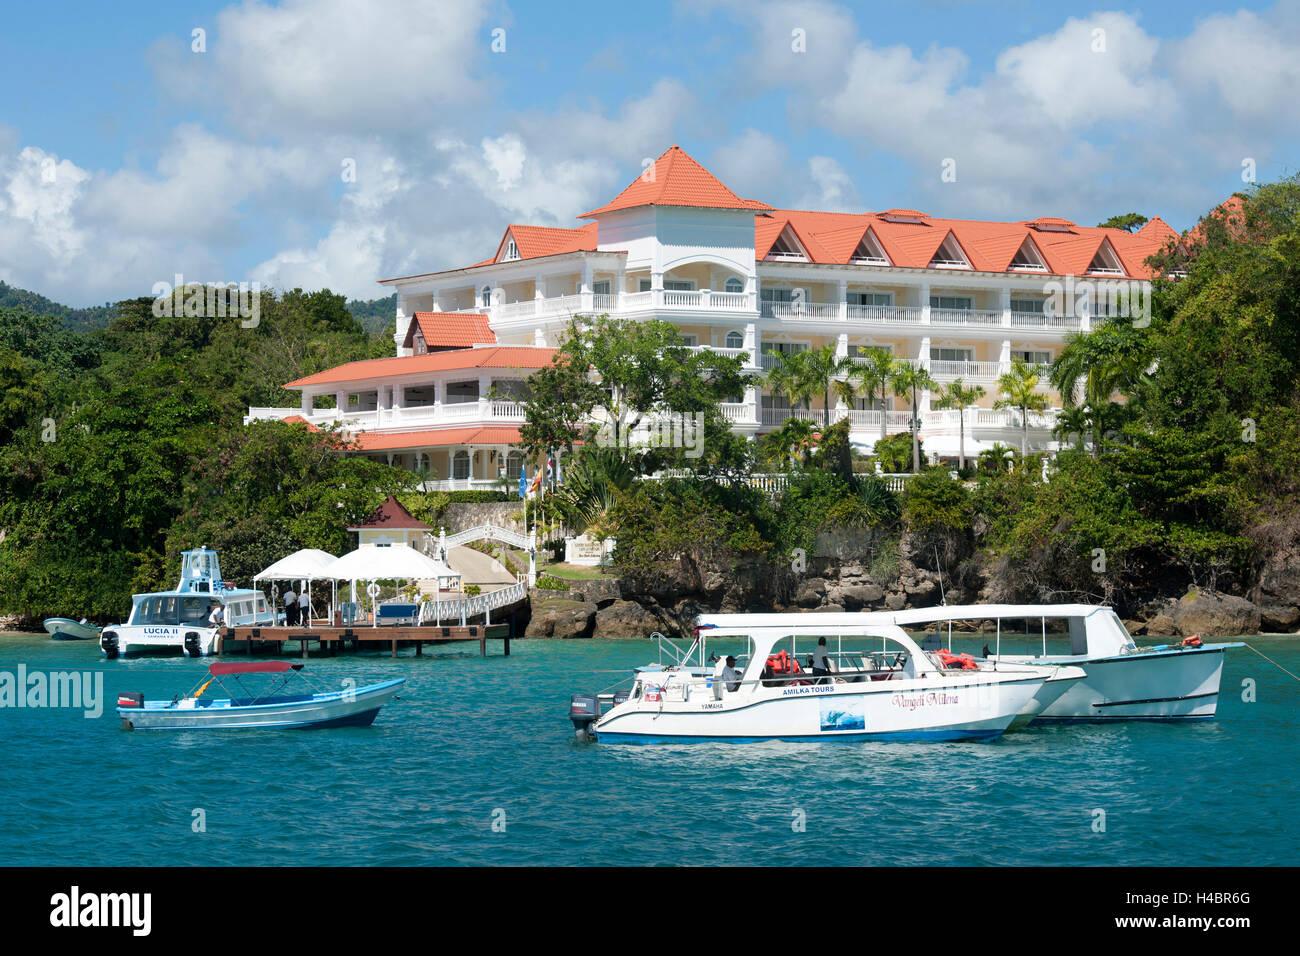 The Dominican Republic, peninsula Samana, Santa Barbara de Samana, island Cayo Levantado (Bacardi island), hotel - Stock Image